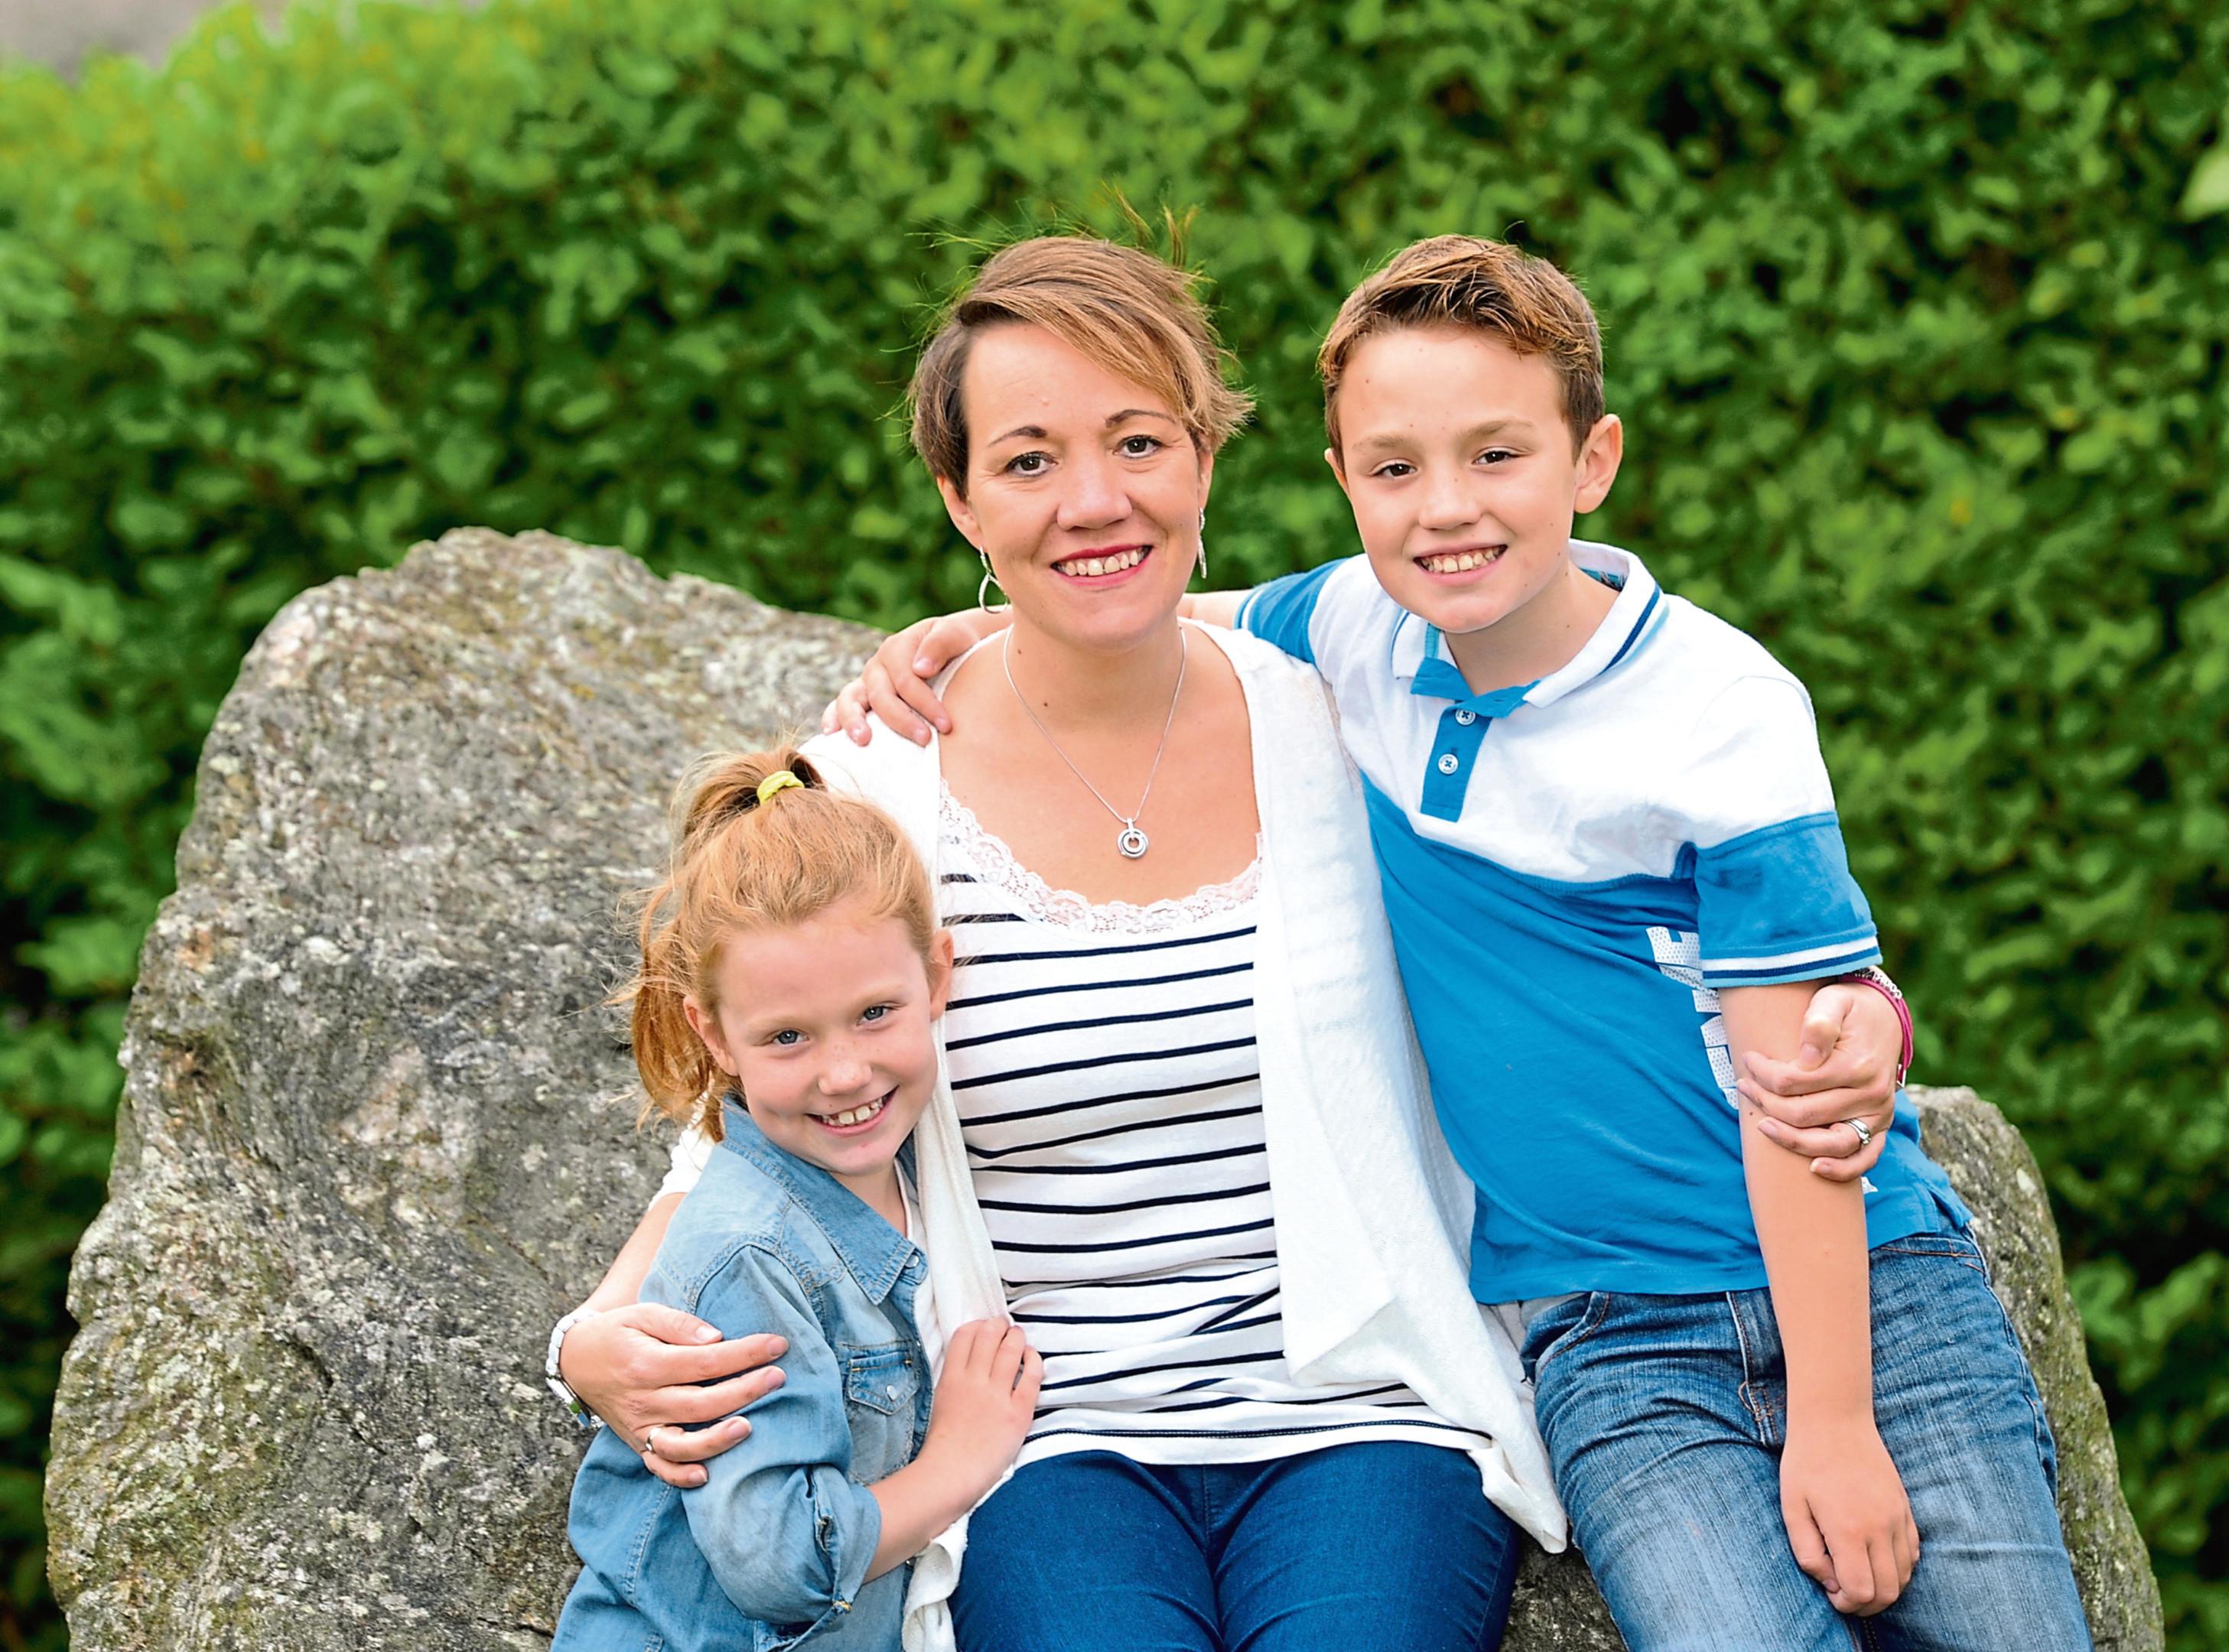 Suzanne Davies and her children Lauren and Max.